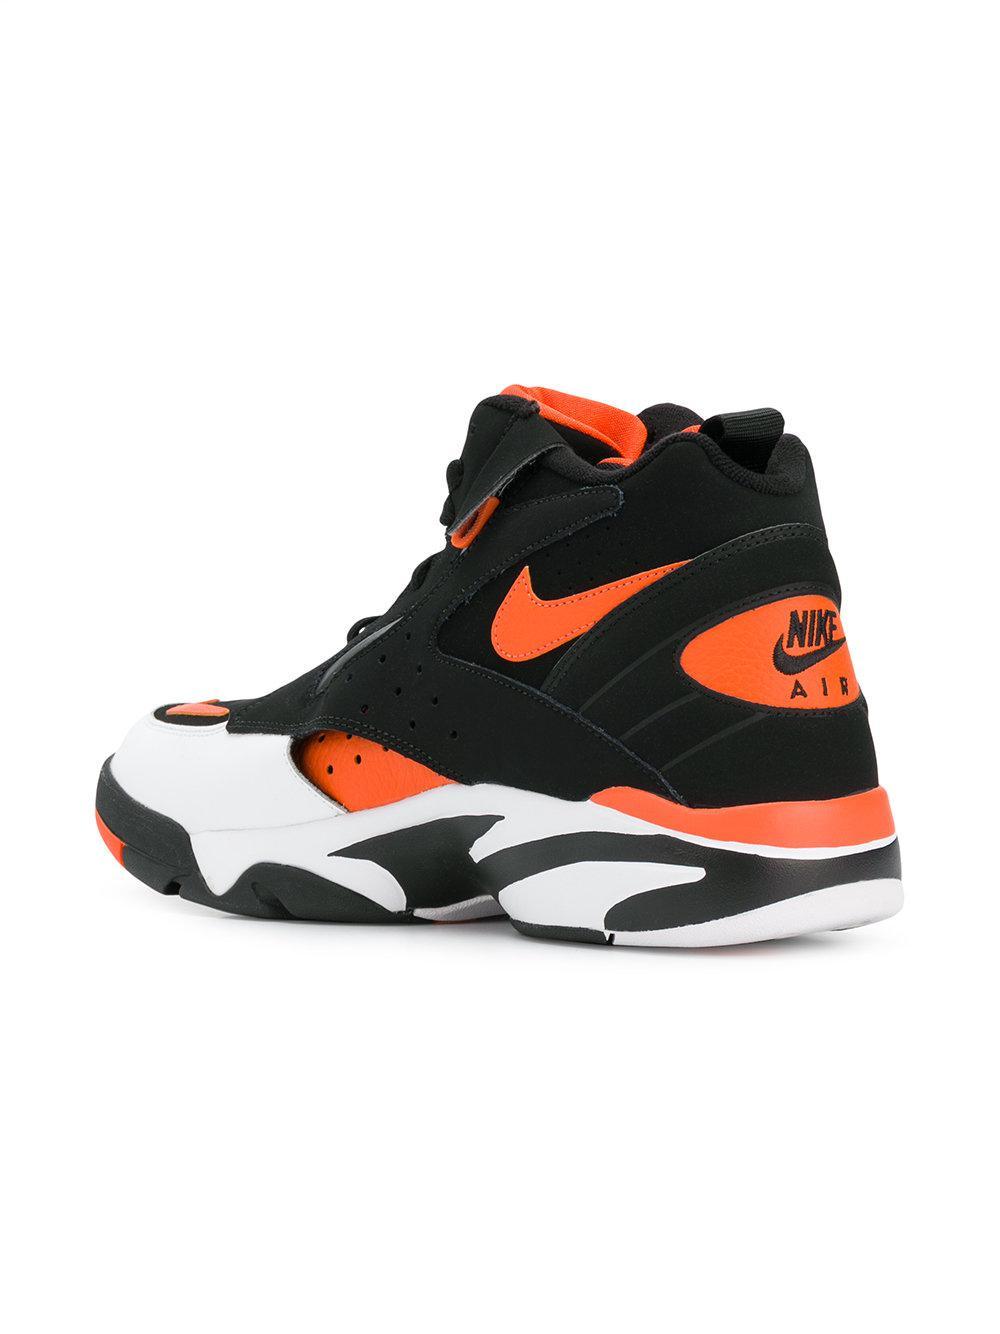 new style 745fb 84fc6 Lyst - Nike Air Maestro Ii Ltd Sneakers in Black for Men